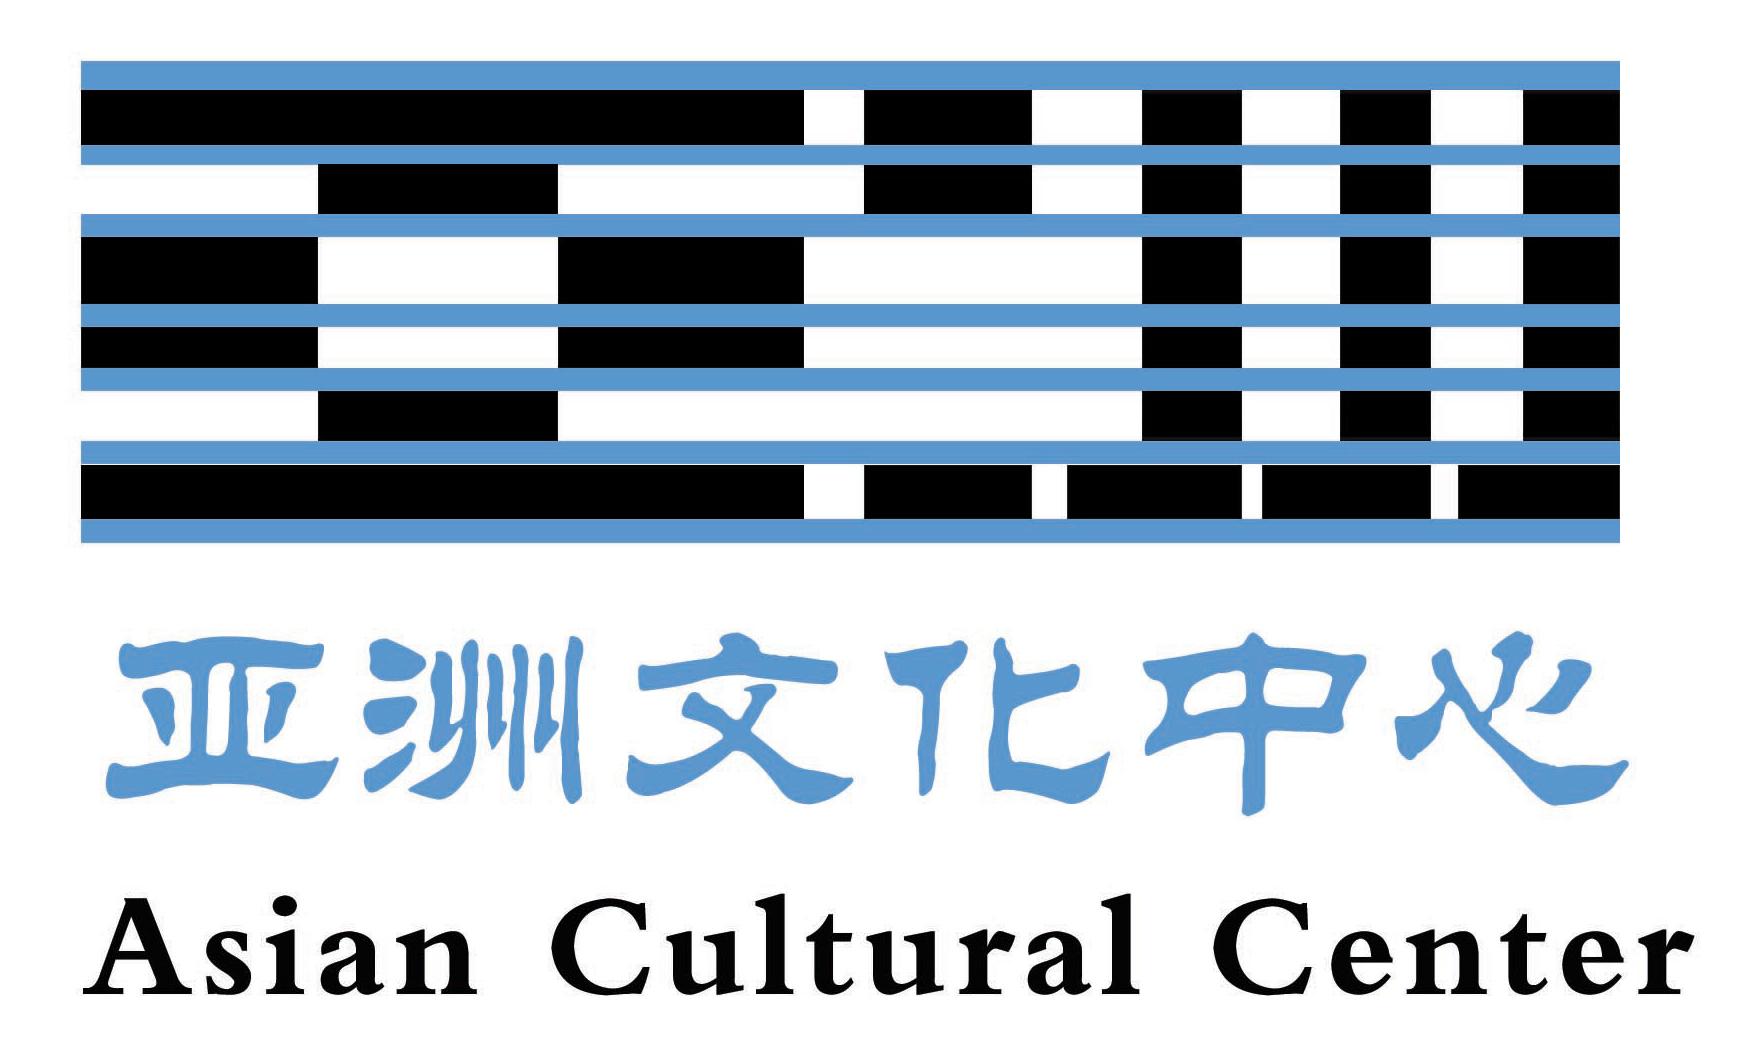 Asian Cultural Center